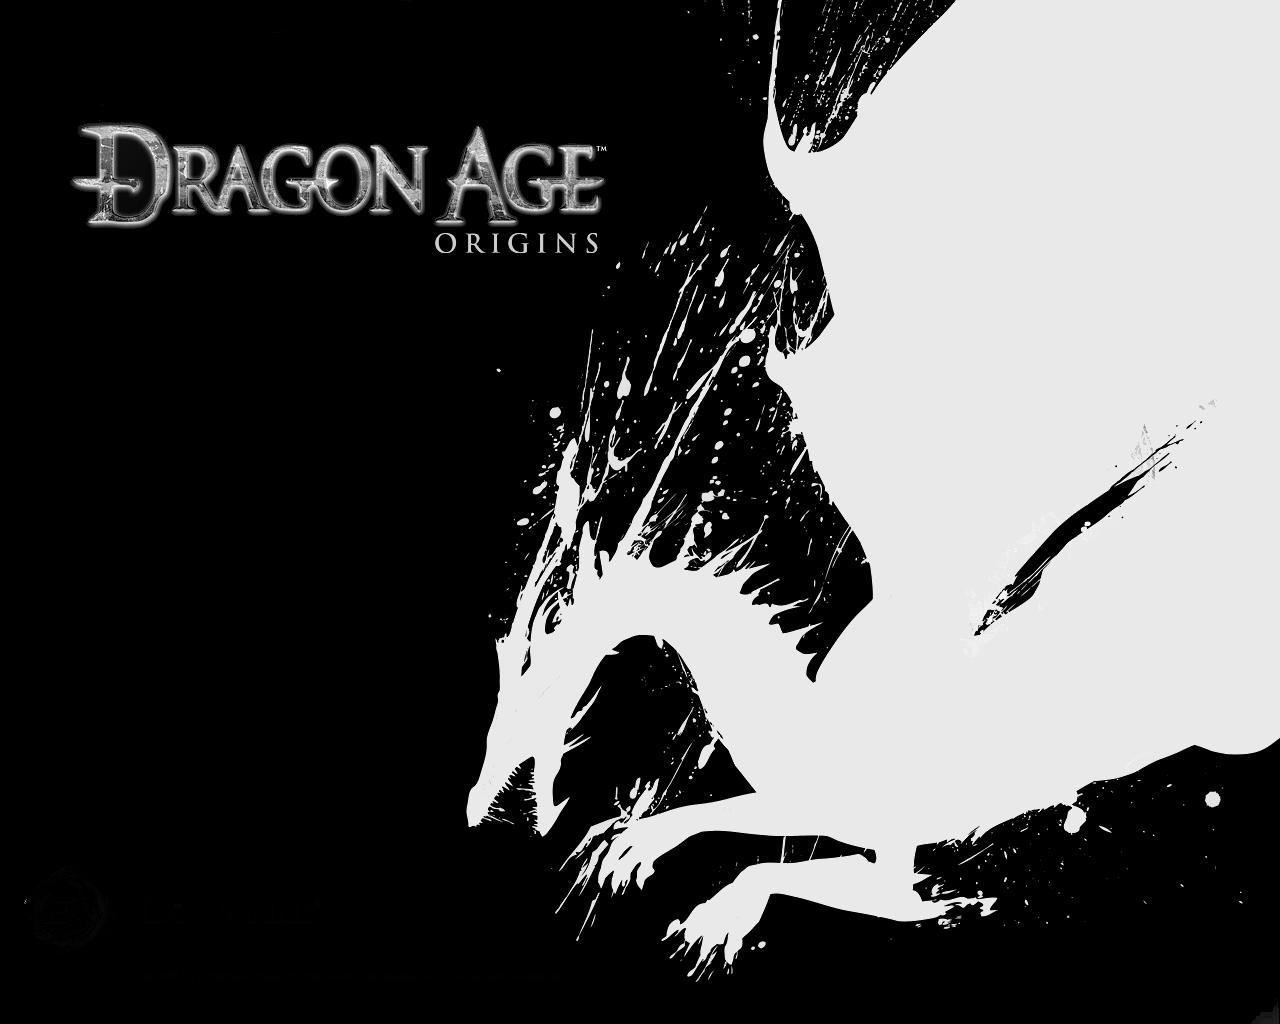 1280x1024px dragon age origins wallpaper hd - wallpapersafari